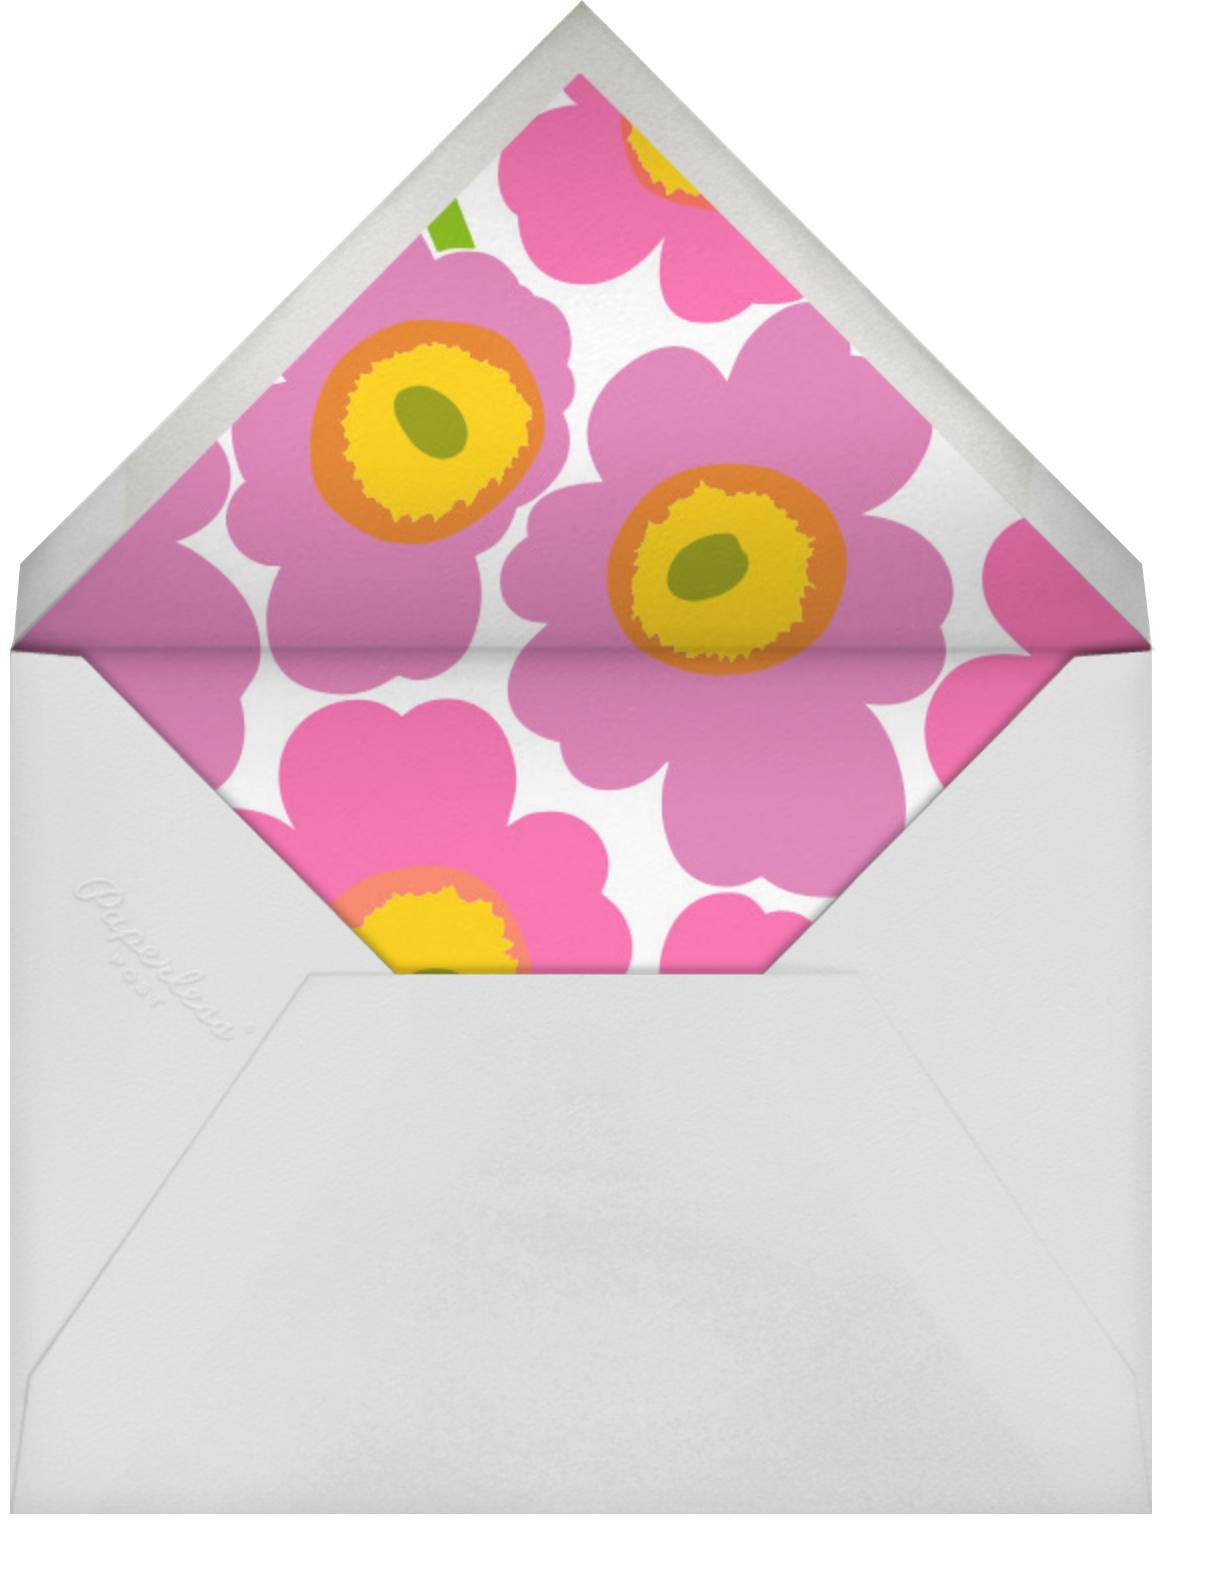 Unikko (Save the Date) - Pink/Lilac - Marimekko - Marimekko - envelope back